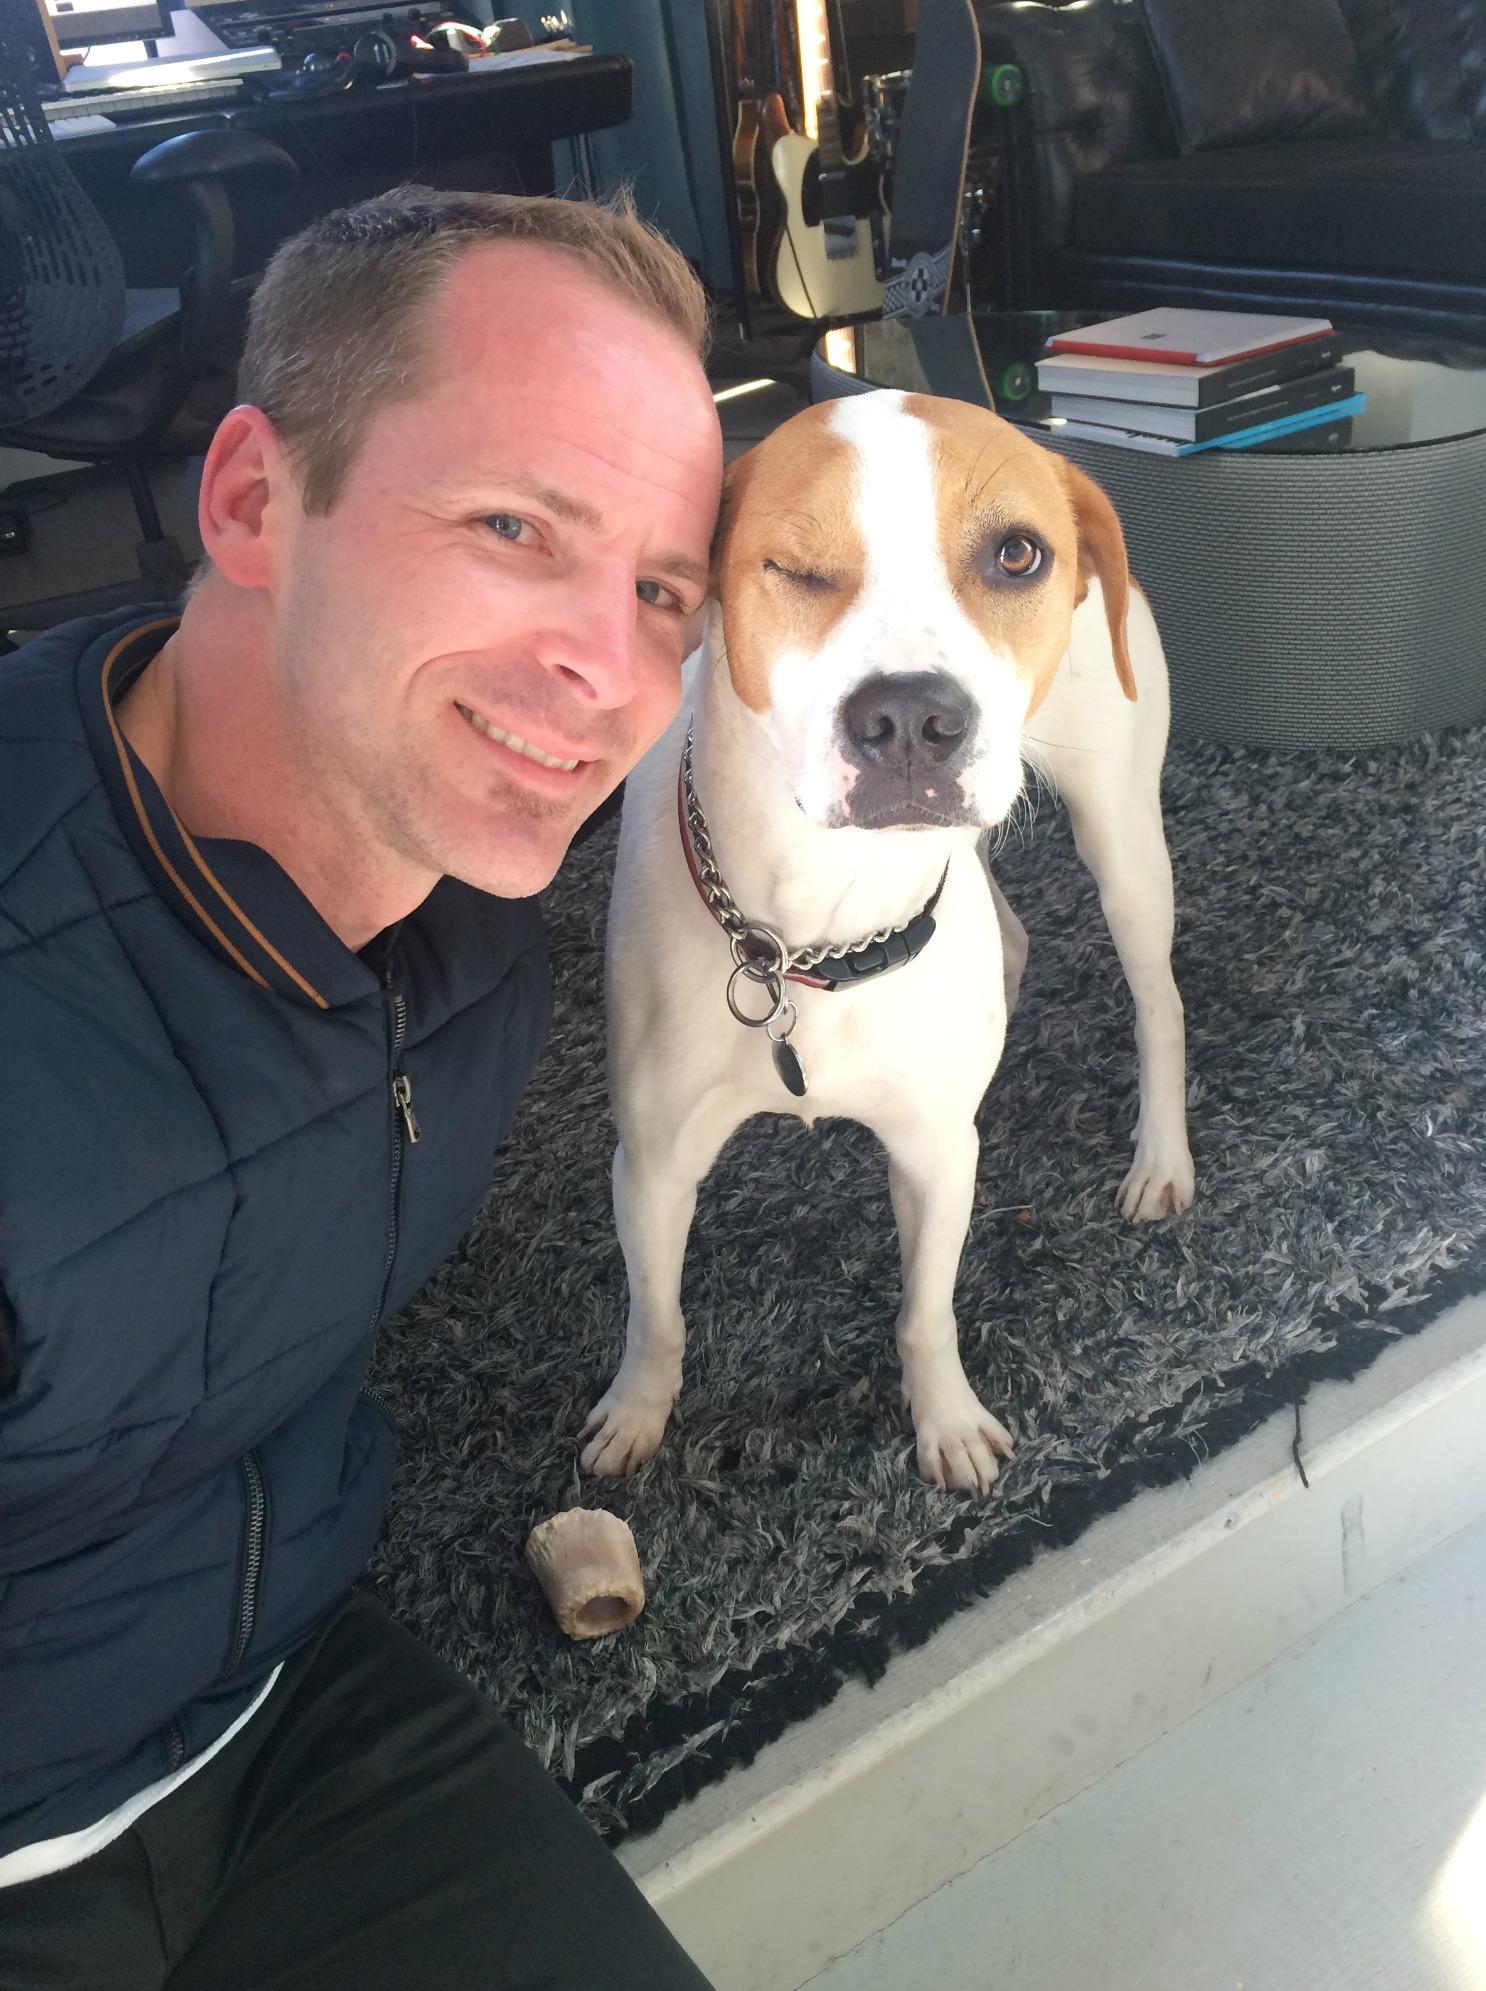 Scott with popeye the dog